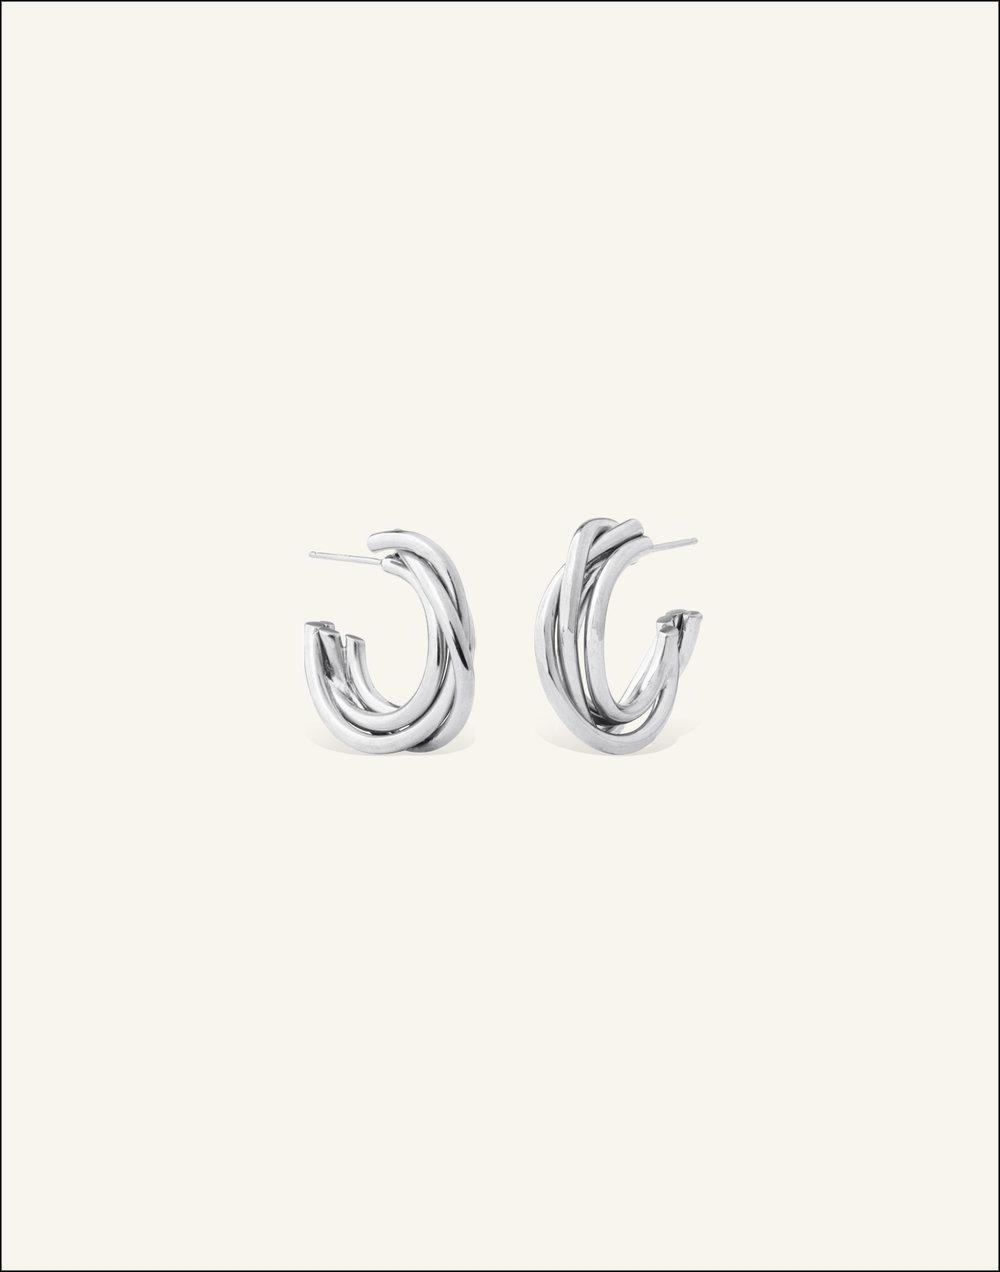 Completedworks-Silver-Earrings-An-Encounter-1-1.jpg